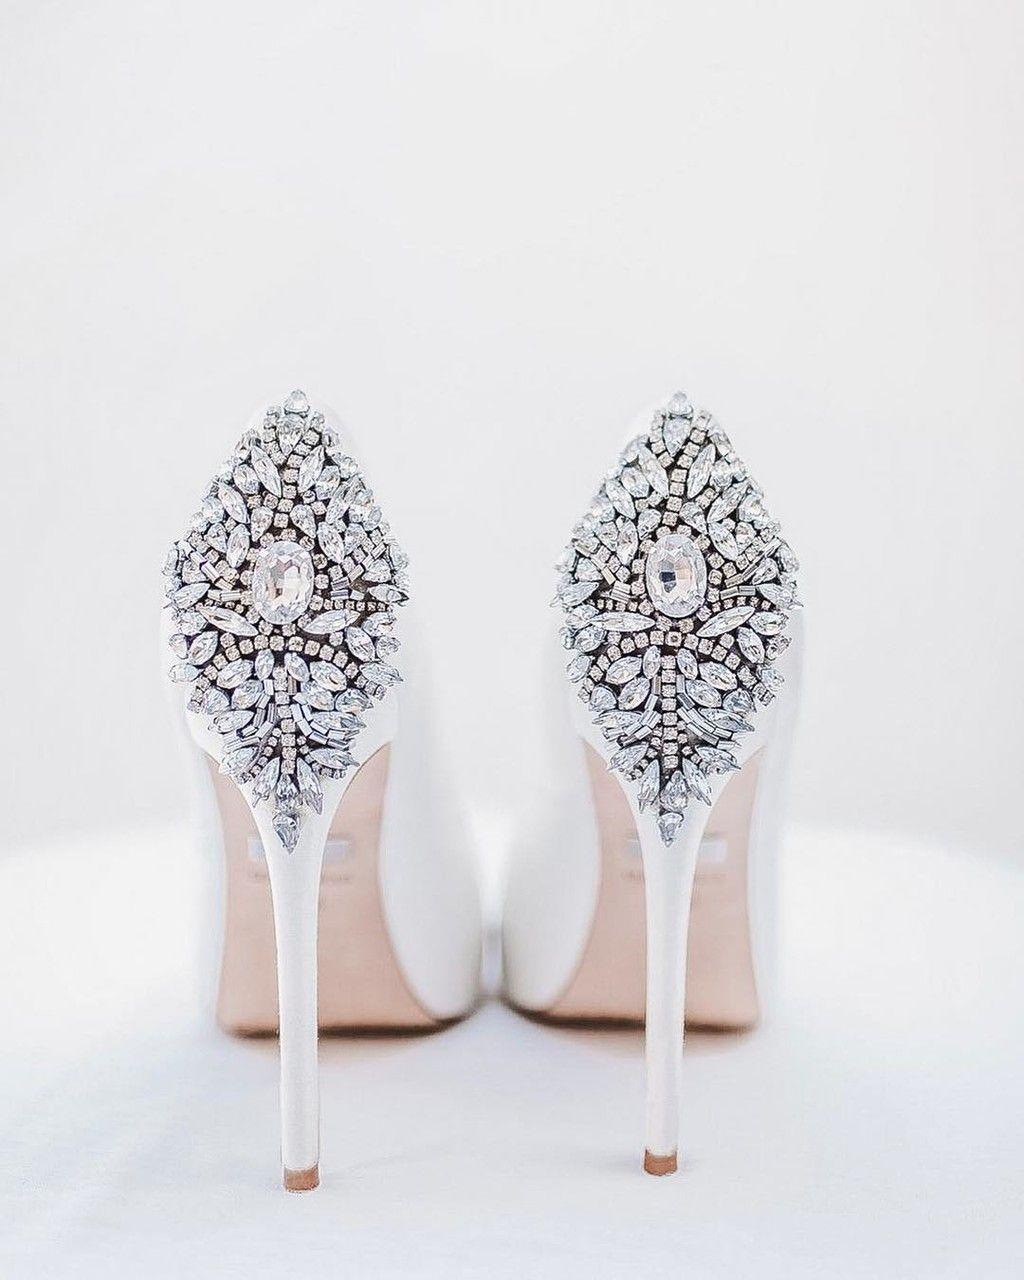 Vanessa Hicks Photography Inspiration Wedding Love Weddingphotography Bridesmaiddress Wedding Elegant Wedding Shoes Sparkly Wedding Shoes Wedding Shoes